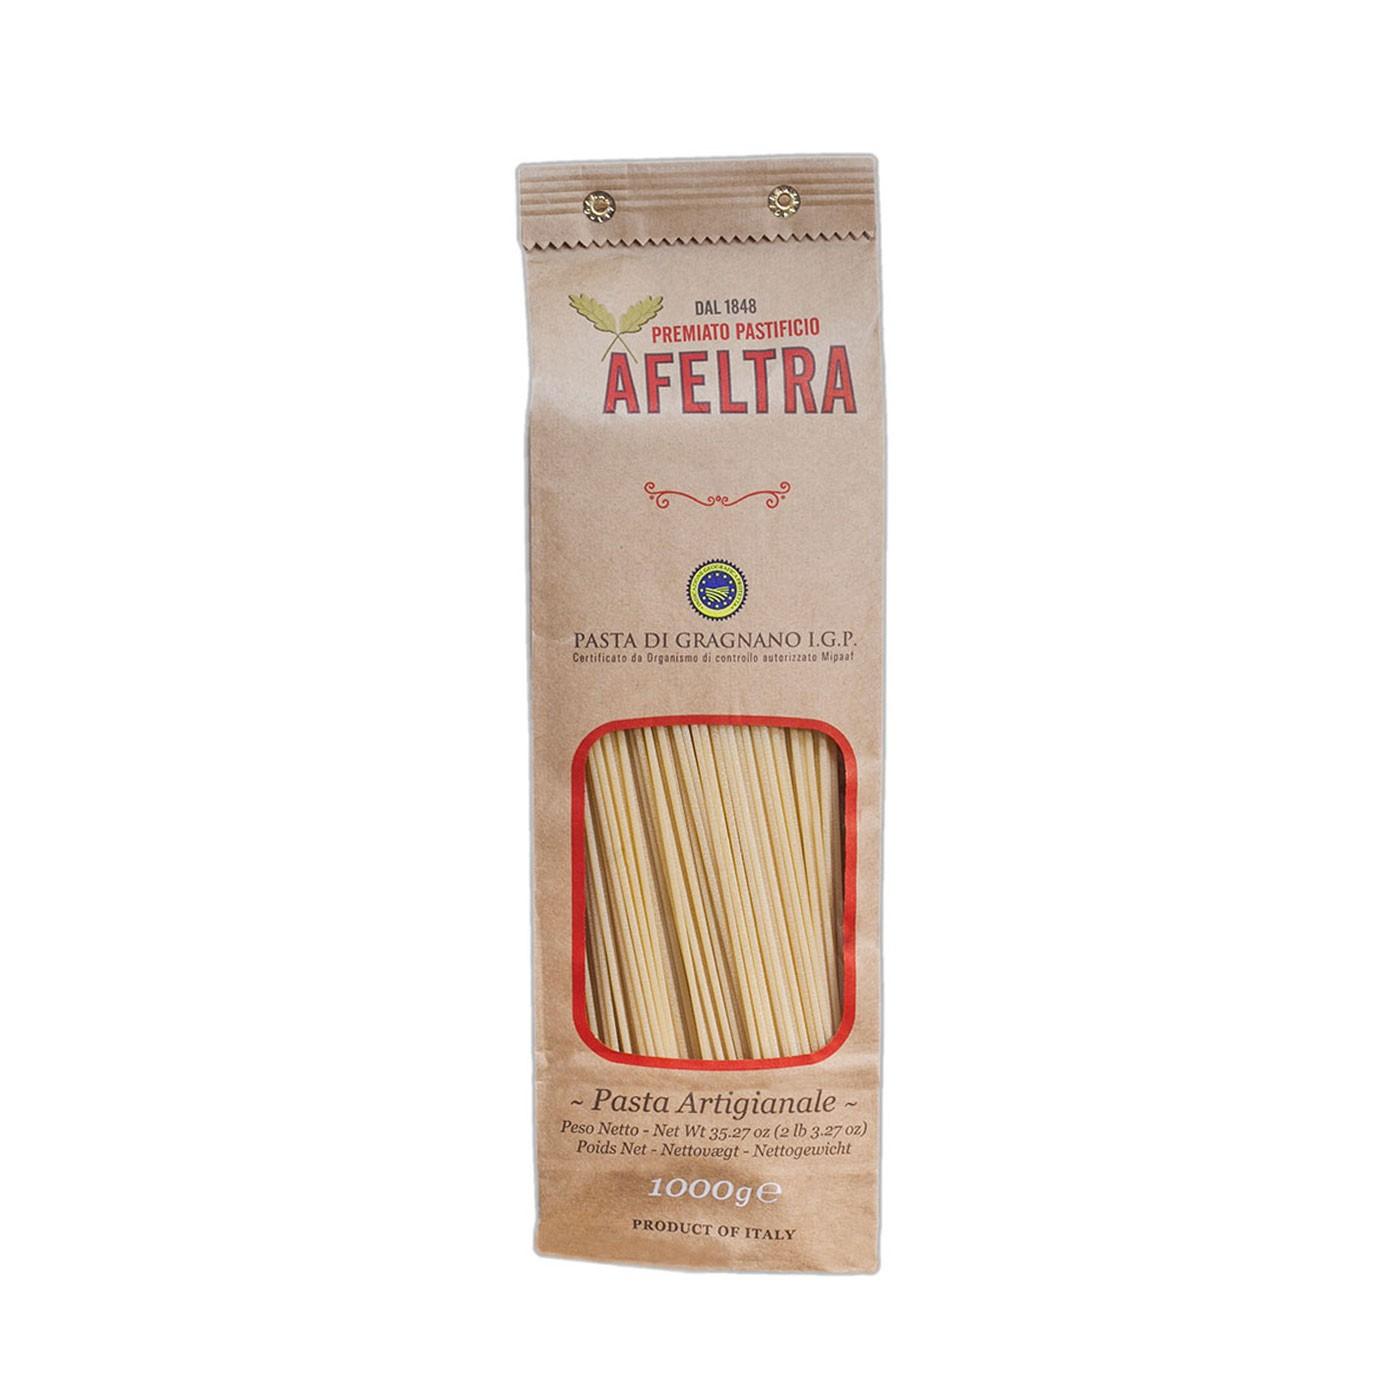 Spaghetti 35.3 oz